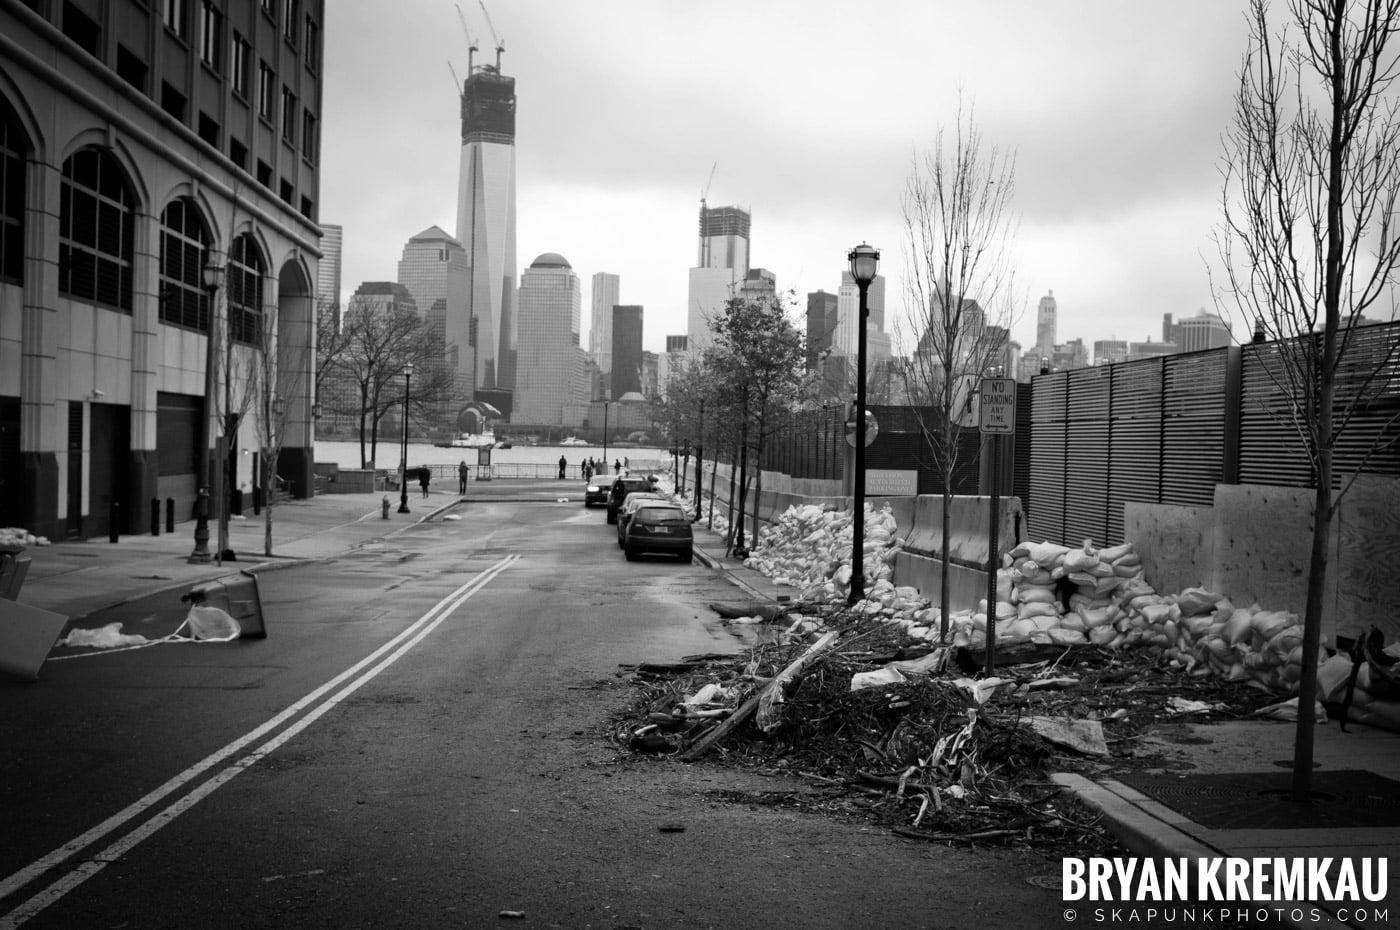 Hurricane Sandy 2012 @ Paulus Hook, Jersey City - 10.29.12 - 10.30.12 (1)